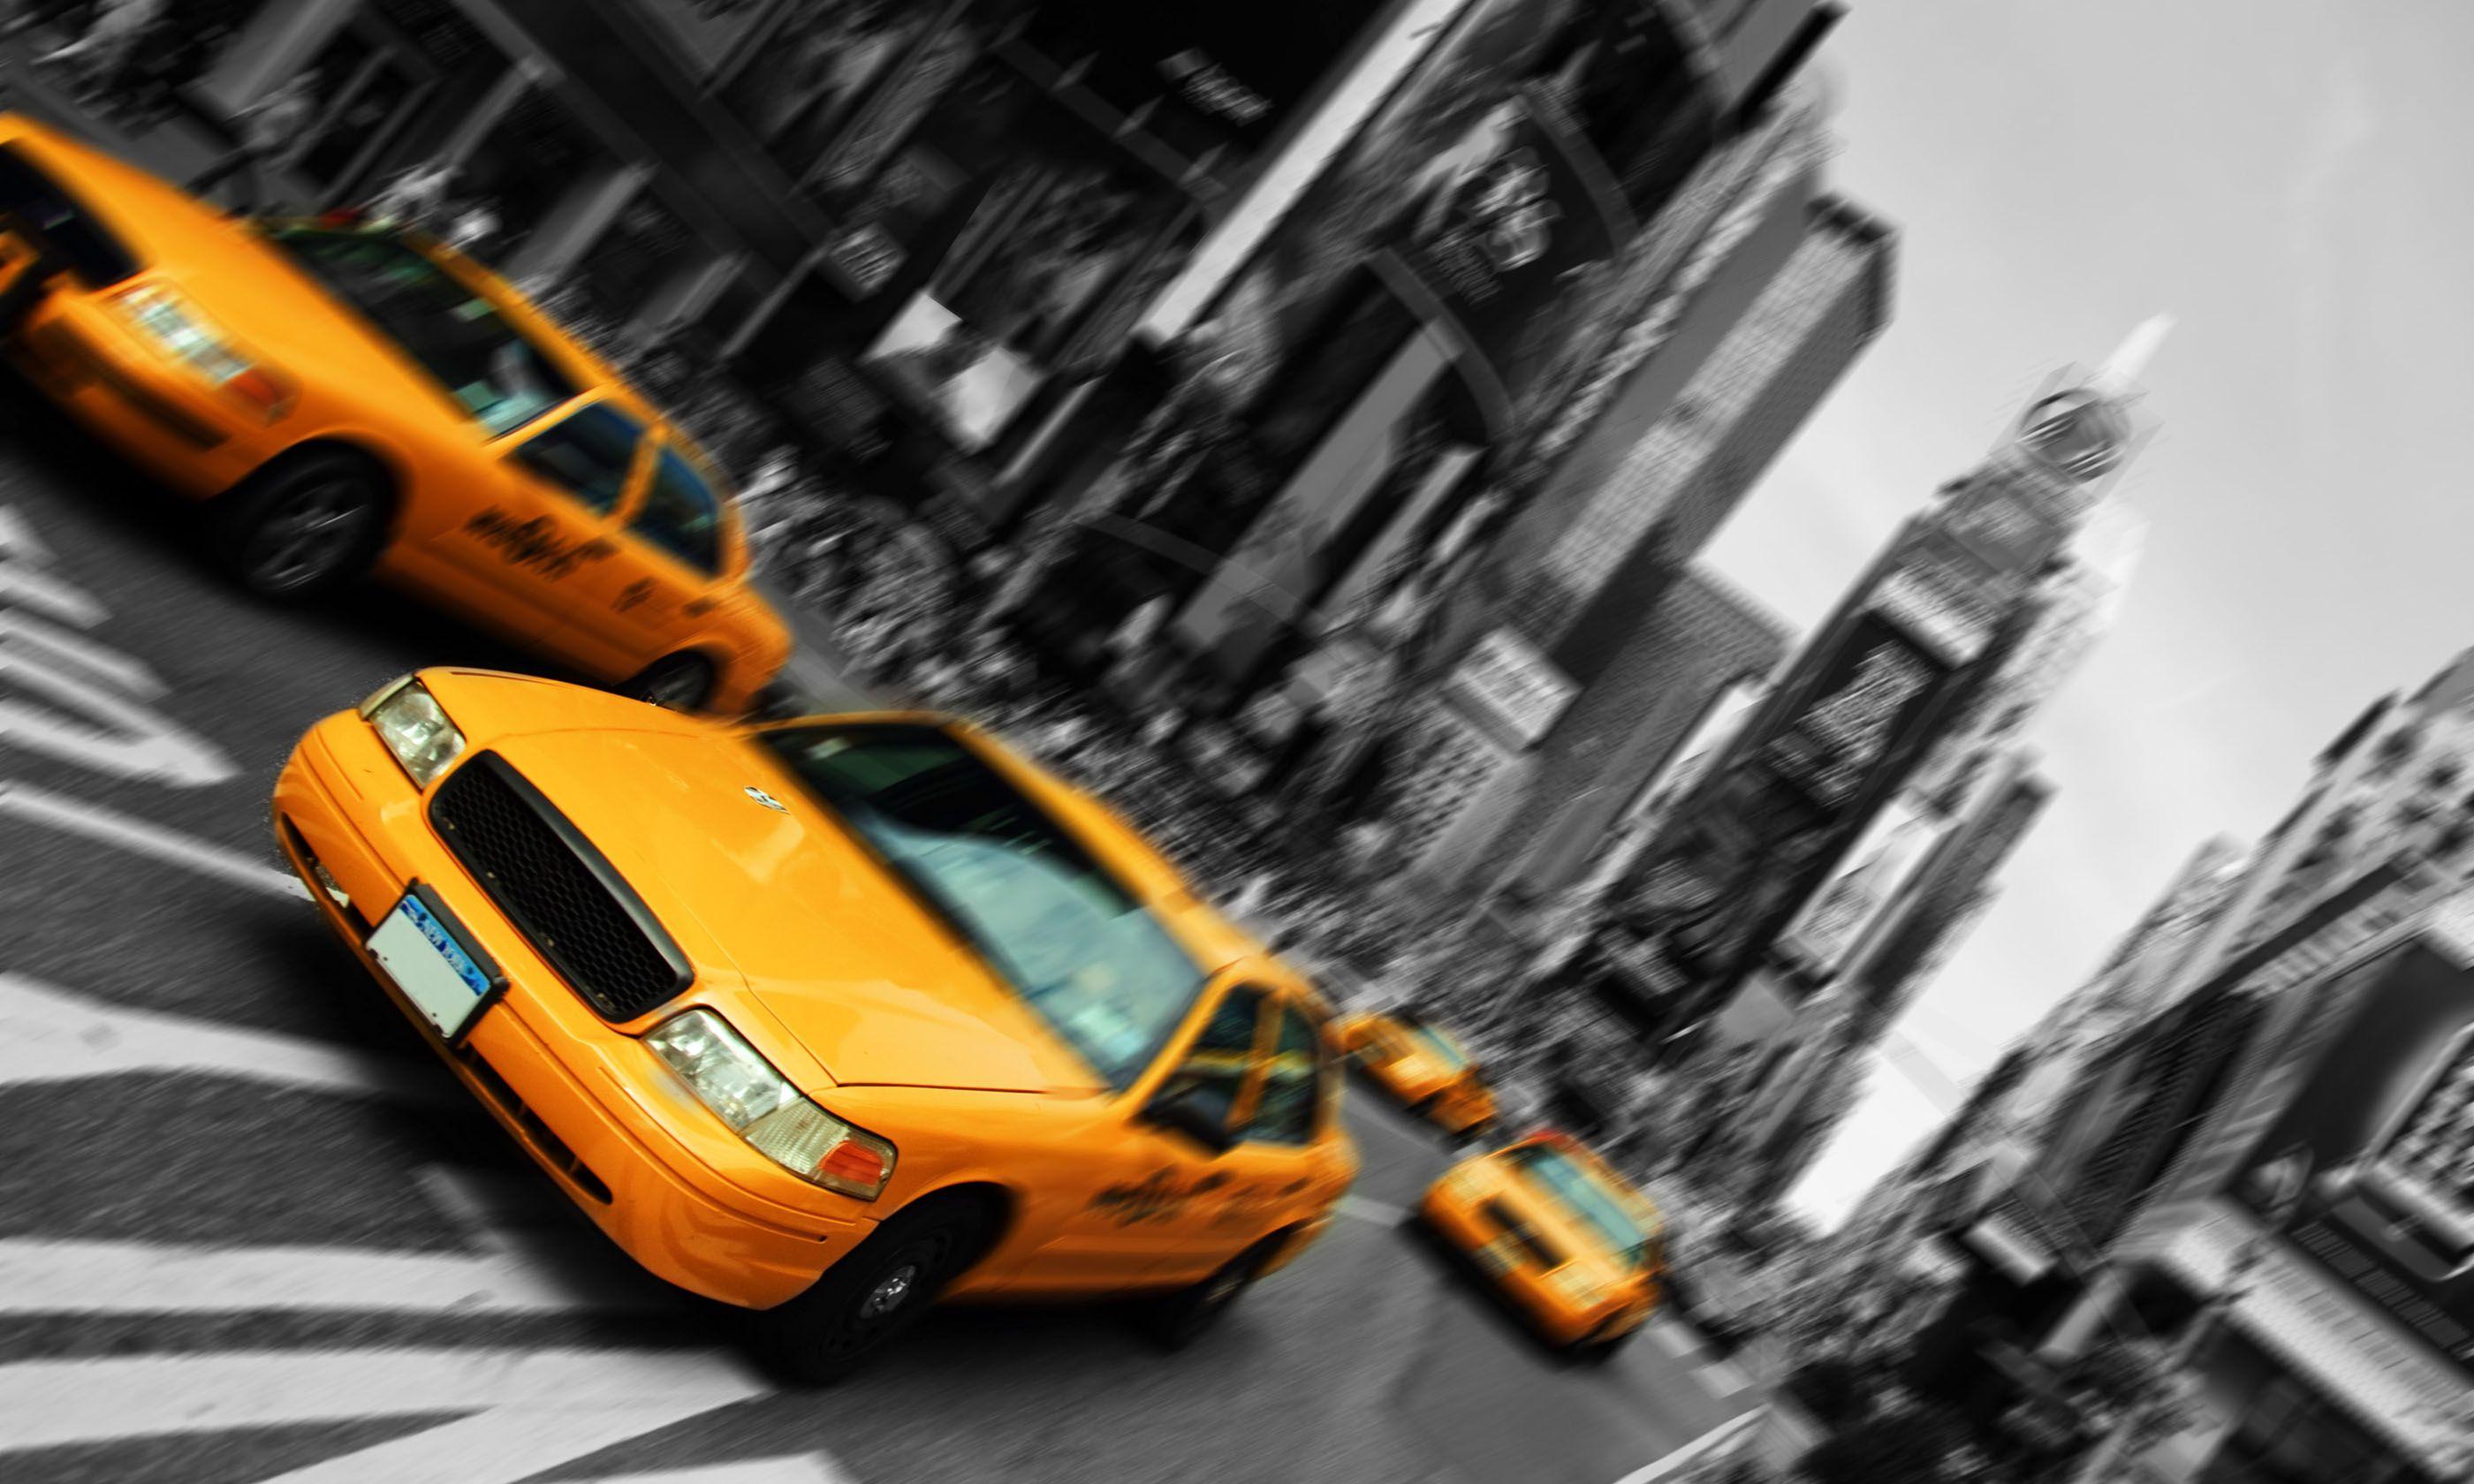 New York cabs (Shutterstock.com)